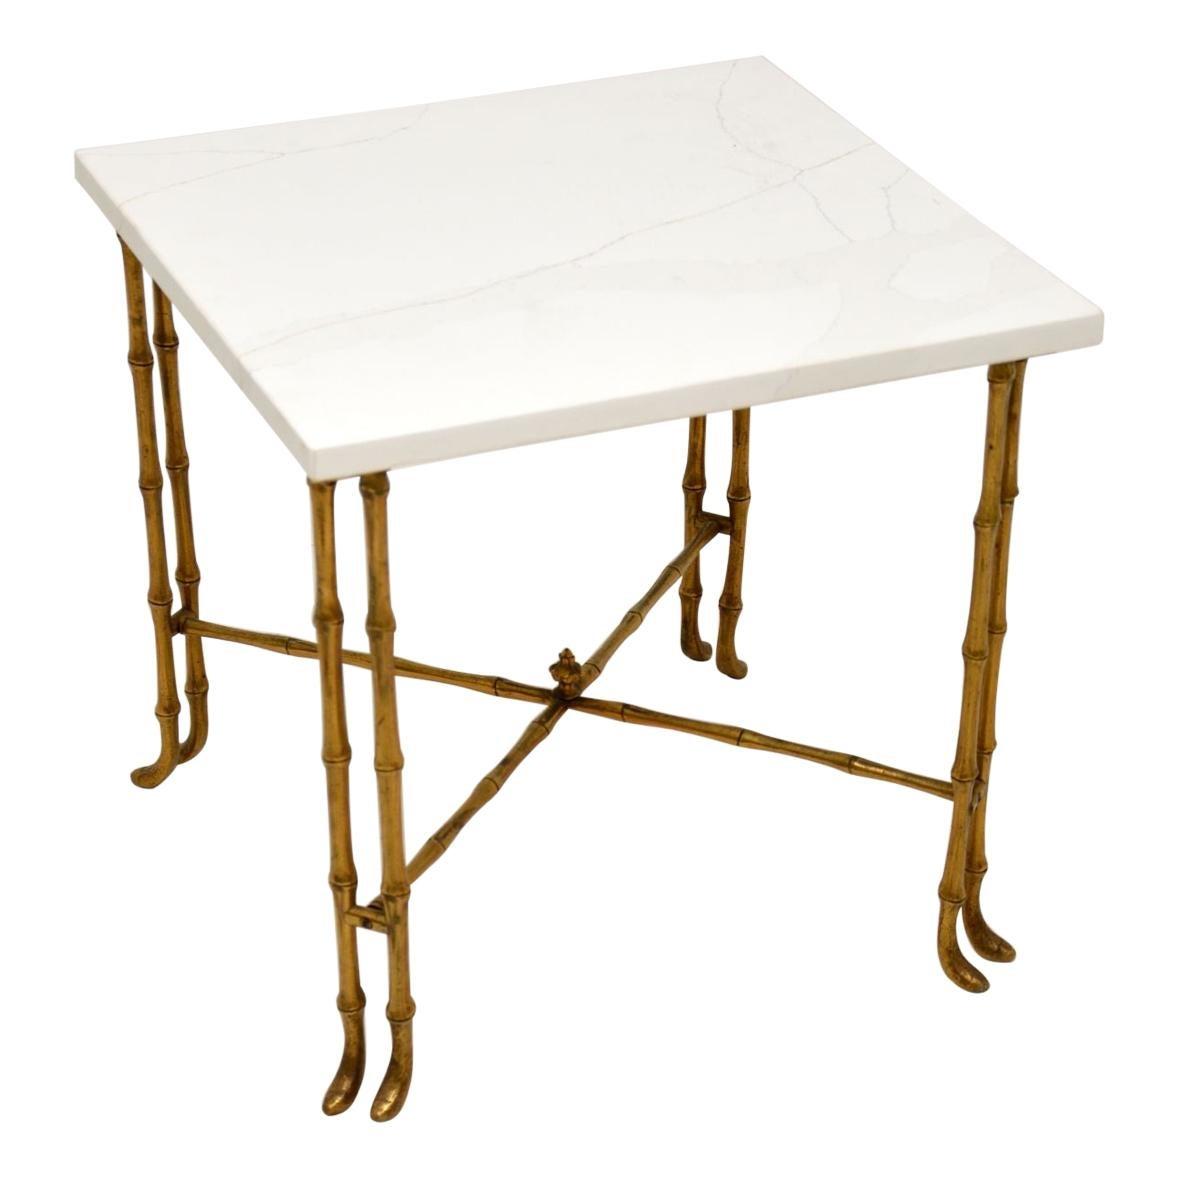 Vintage Brass & White Quartz Side / Coffee Table